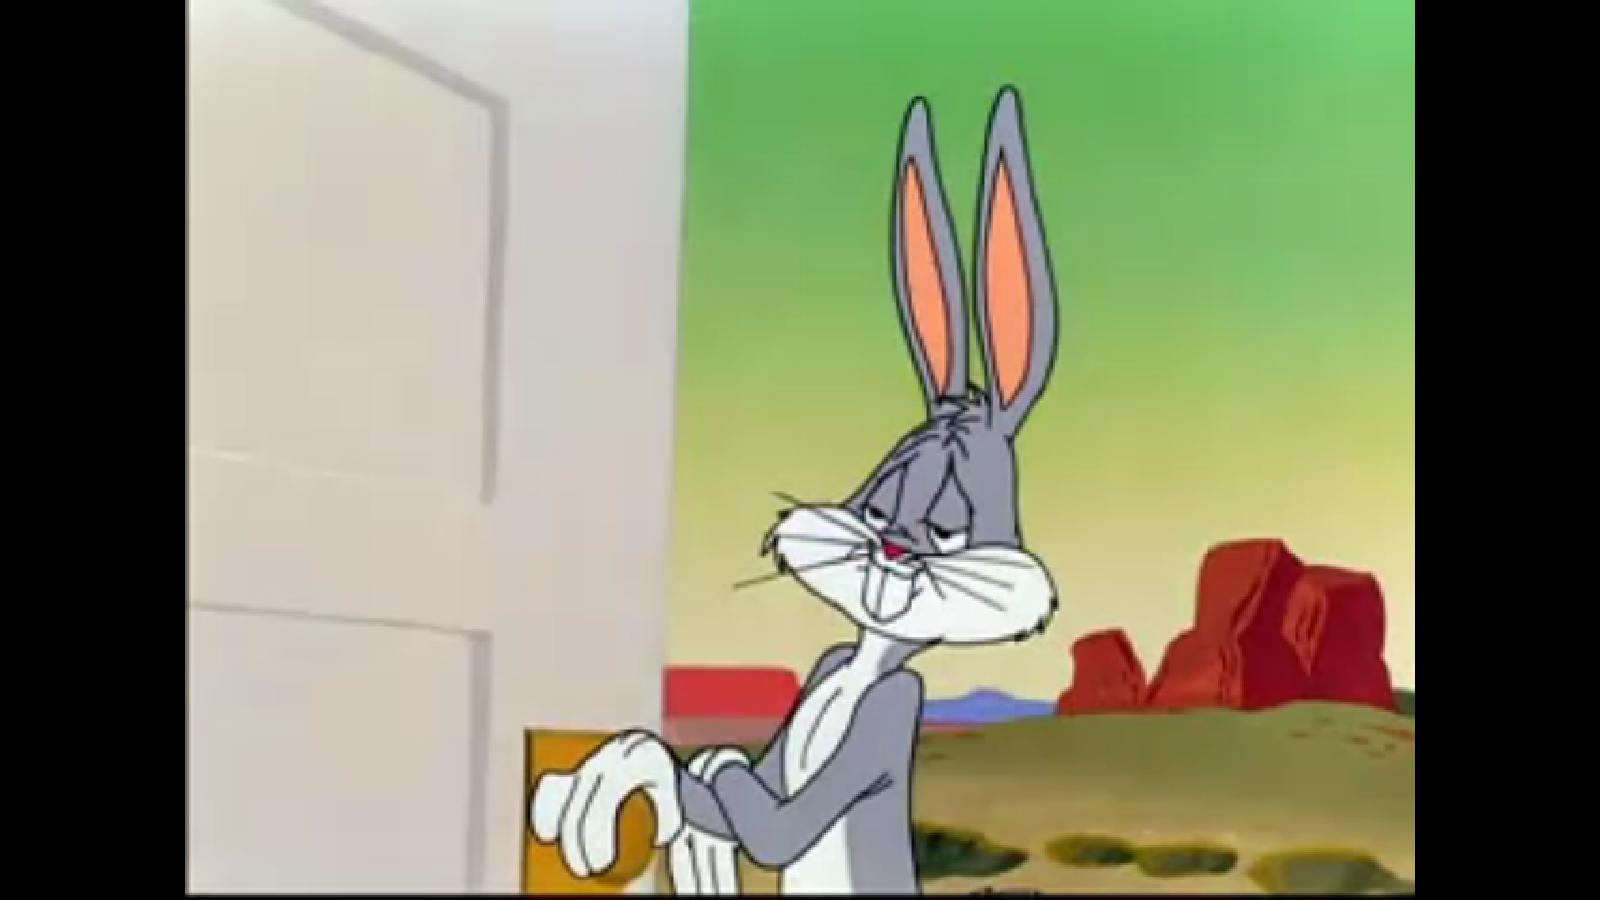 No Bugs Bunny Meme Template